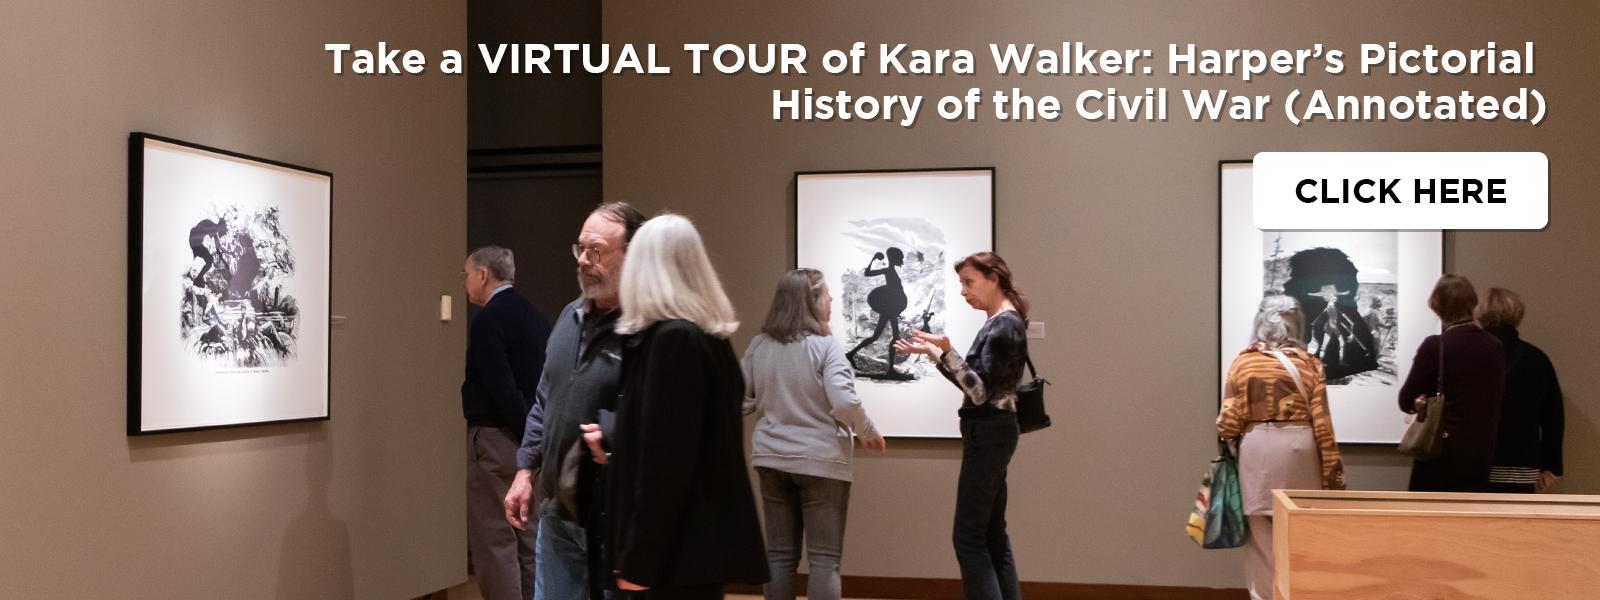 Kara Walker VR Tour